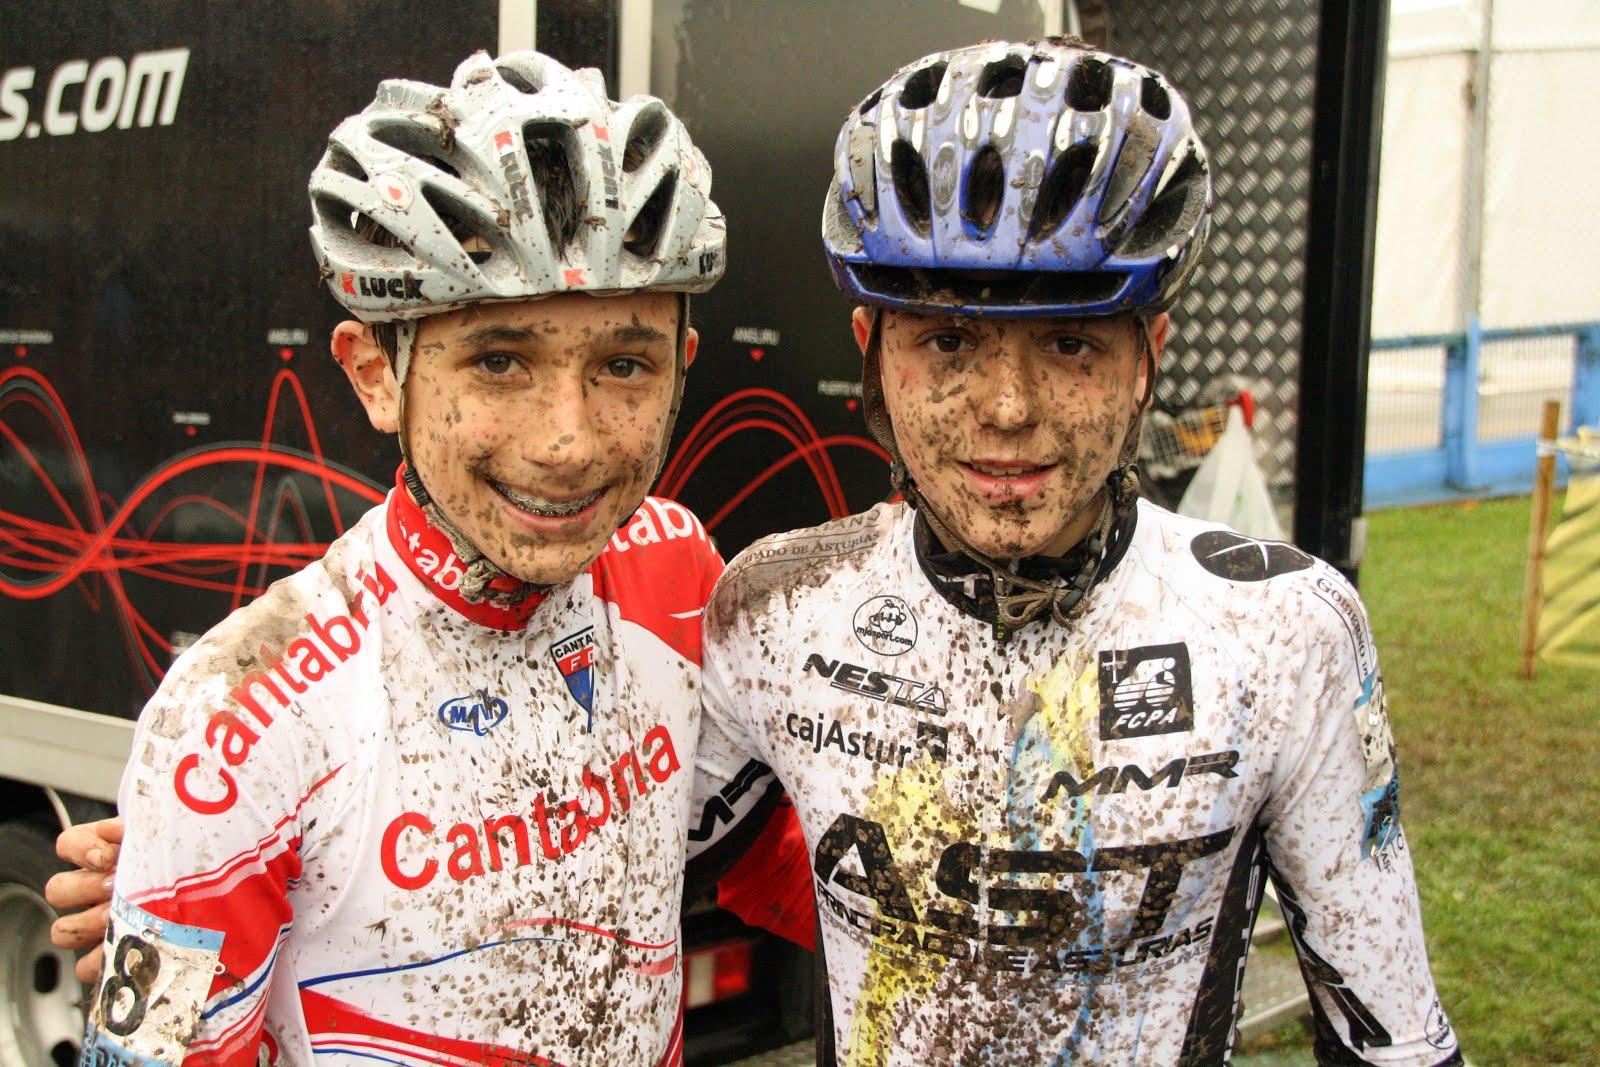 Con mi amigo Juanín - Campeonato de España 2016